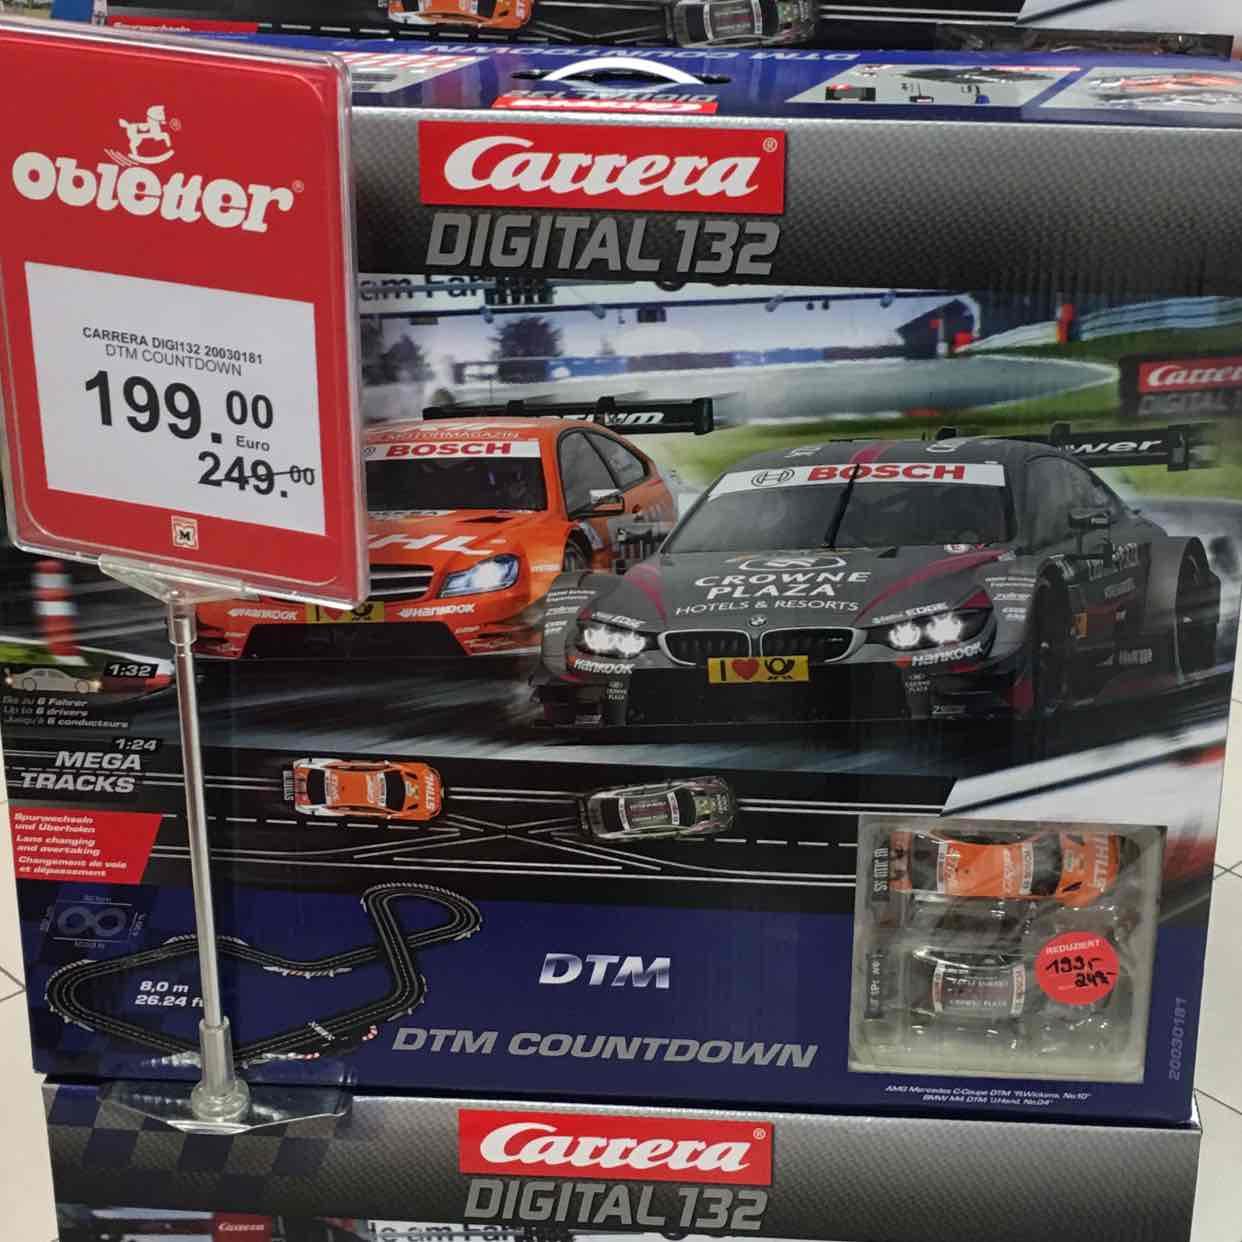 [München] Carrera Digital 132 DTM Countdown (Spielwaren Obletter am Stachus)